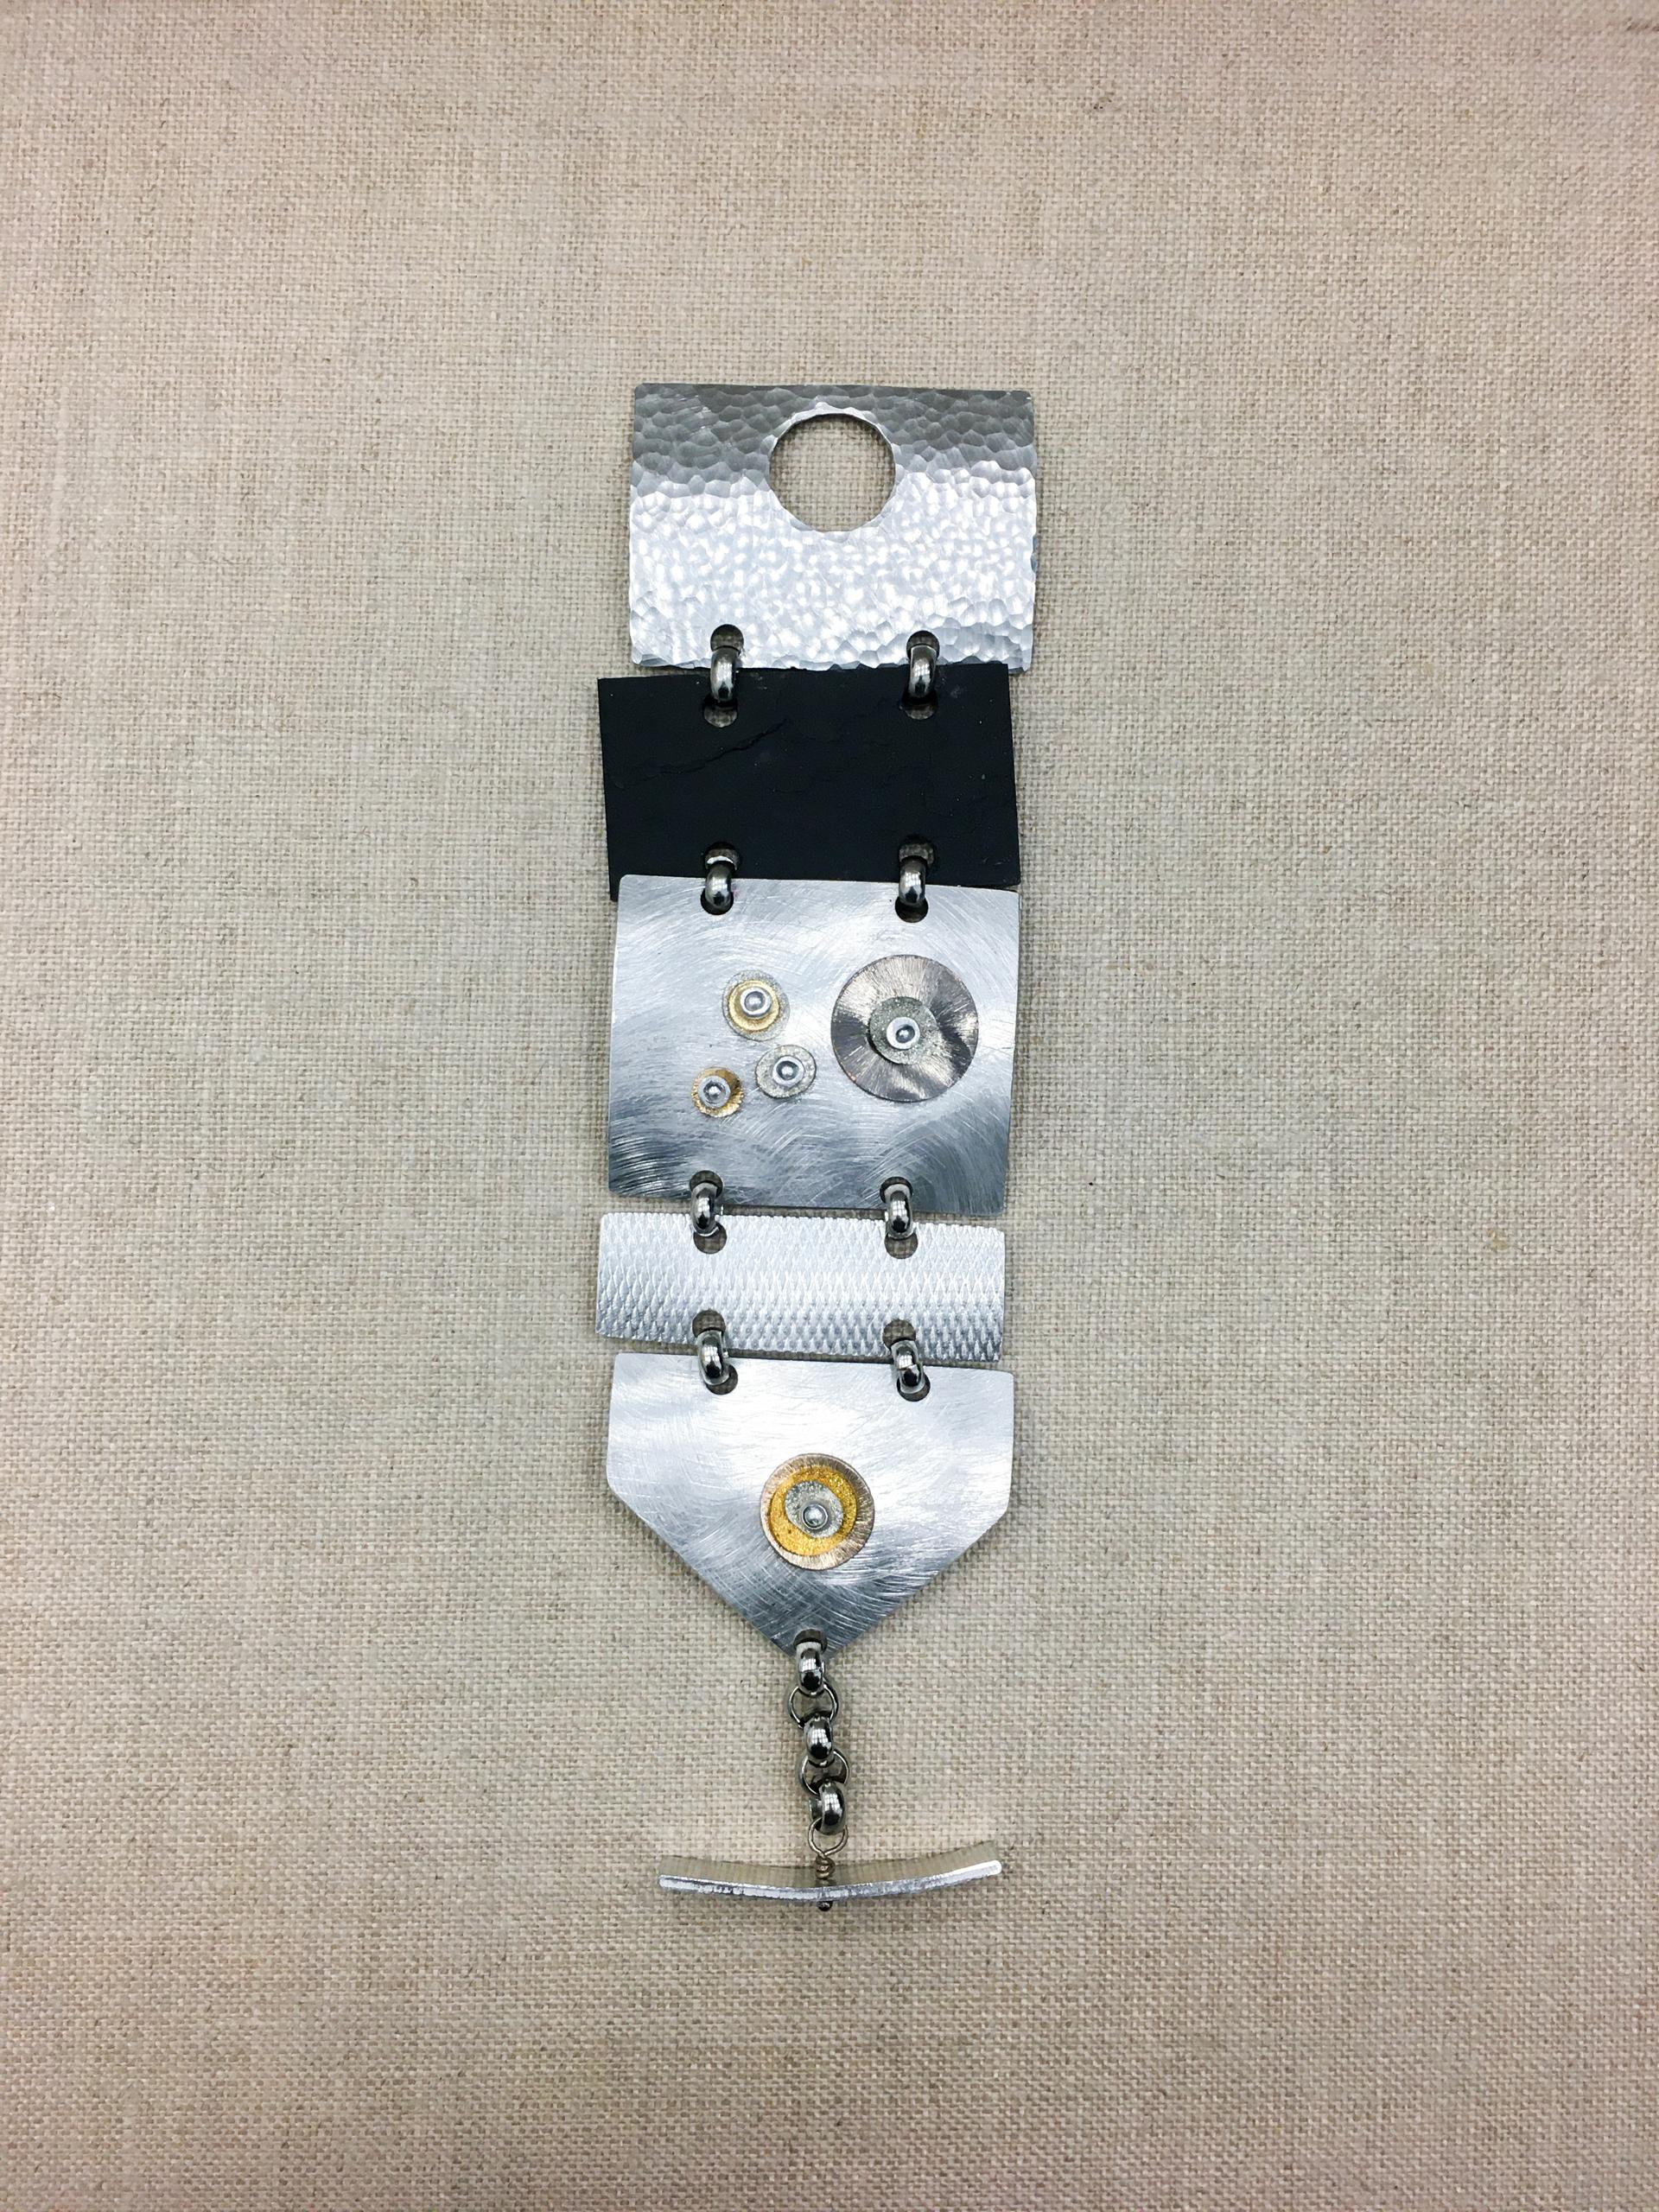 8255 Bracelet by Lori Paulsen